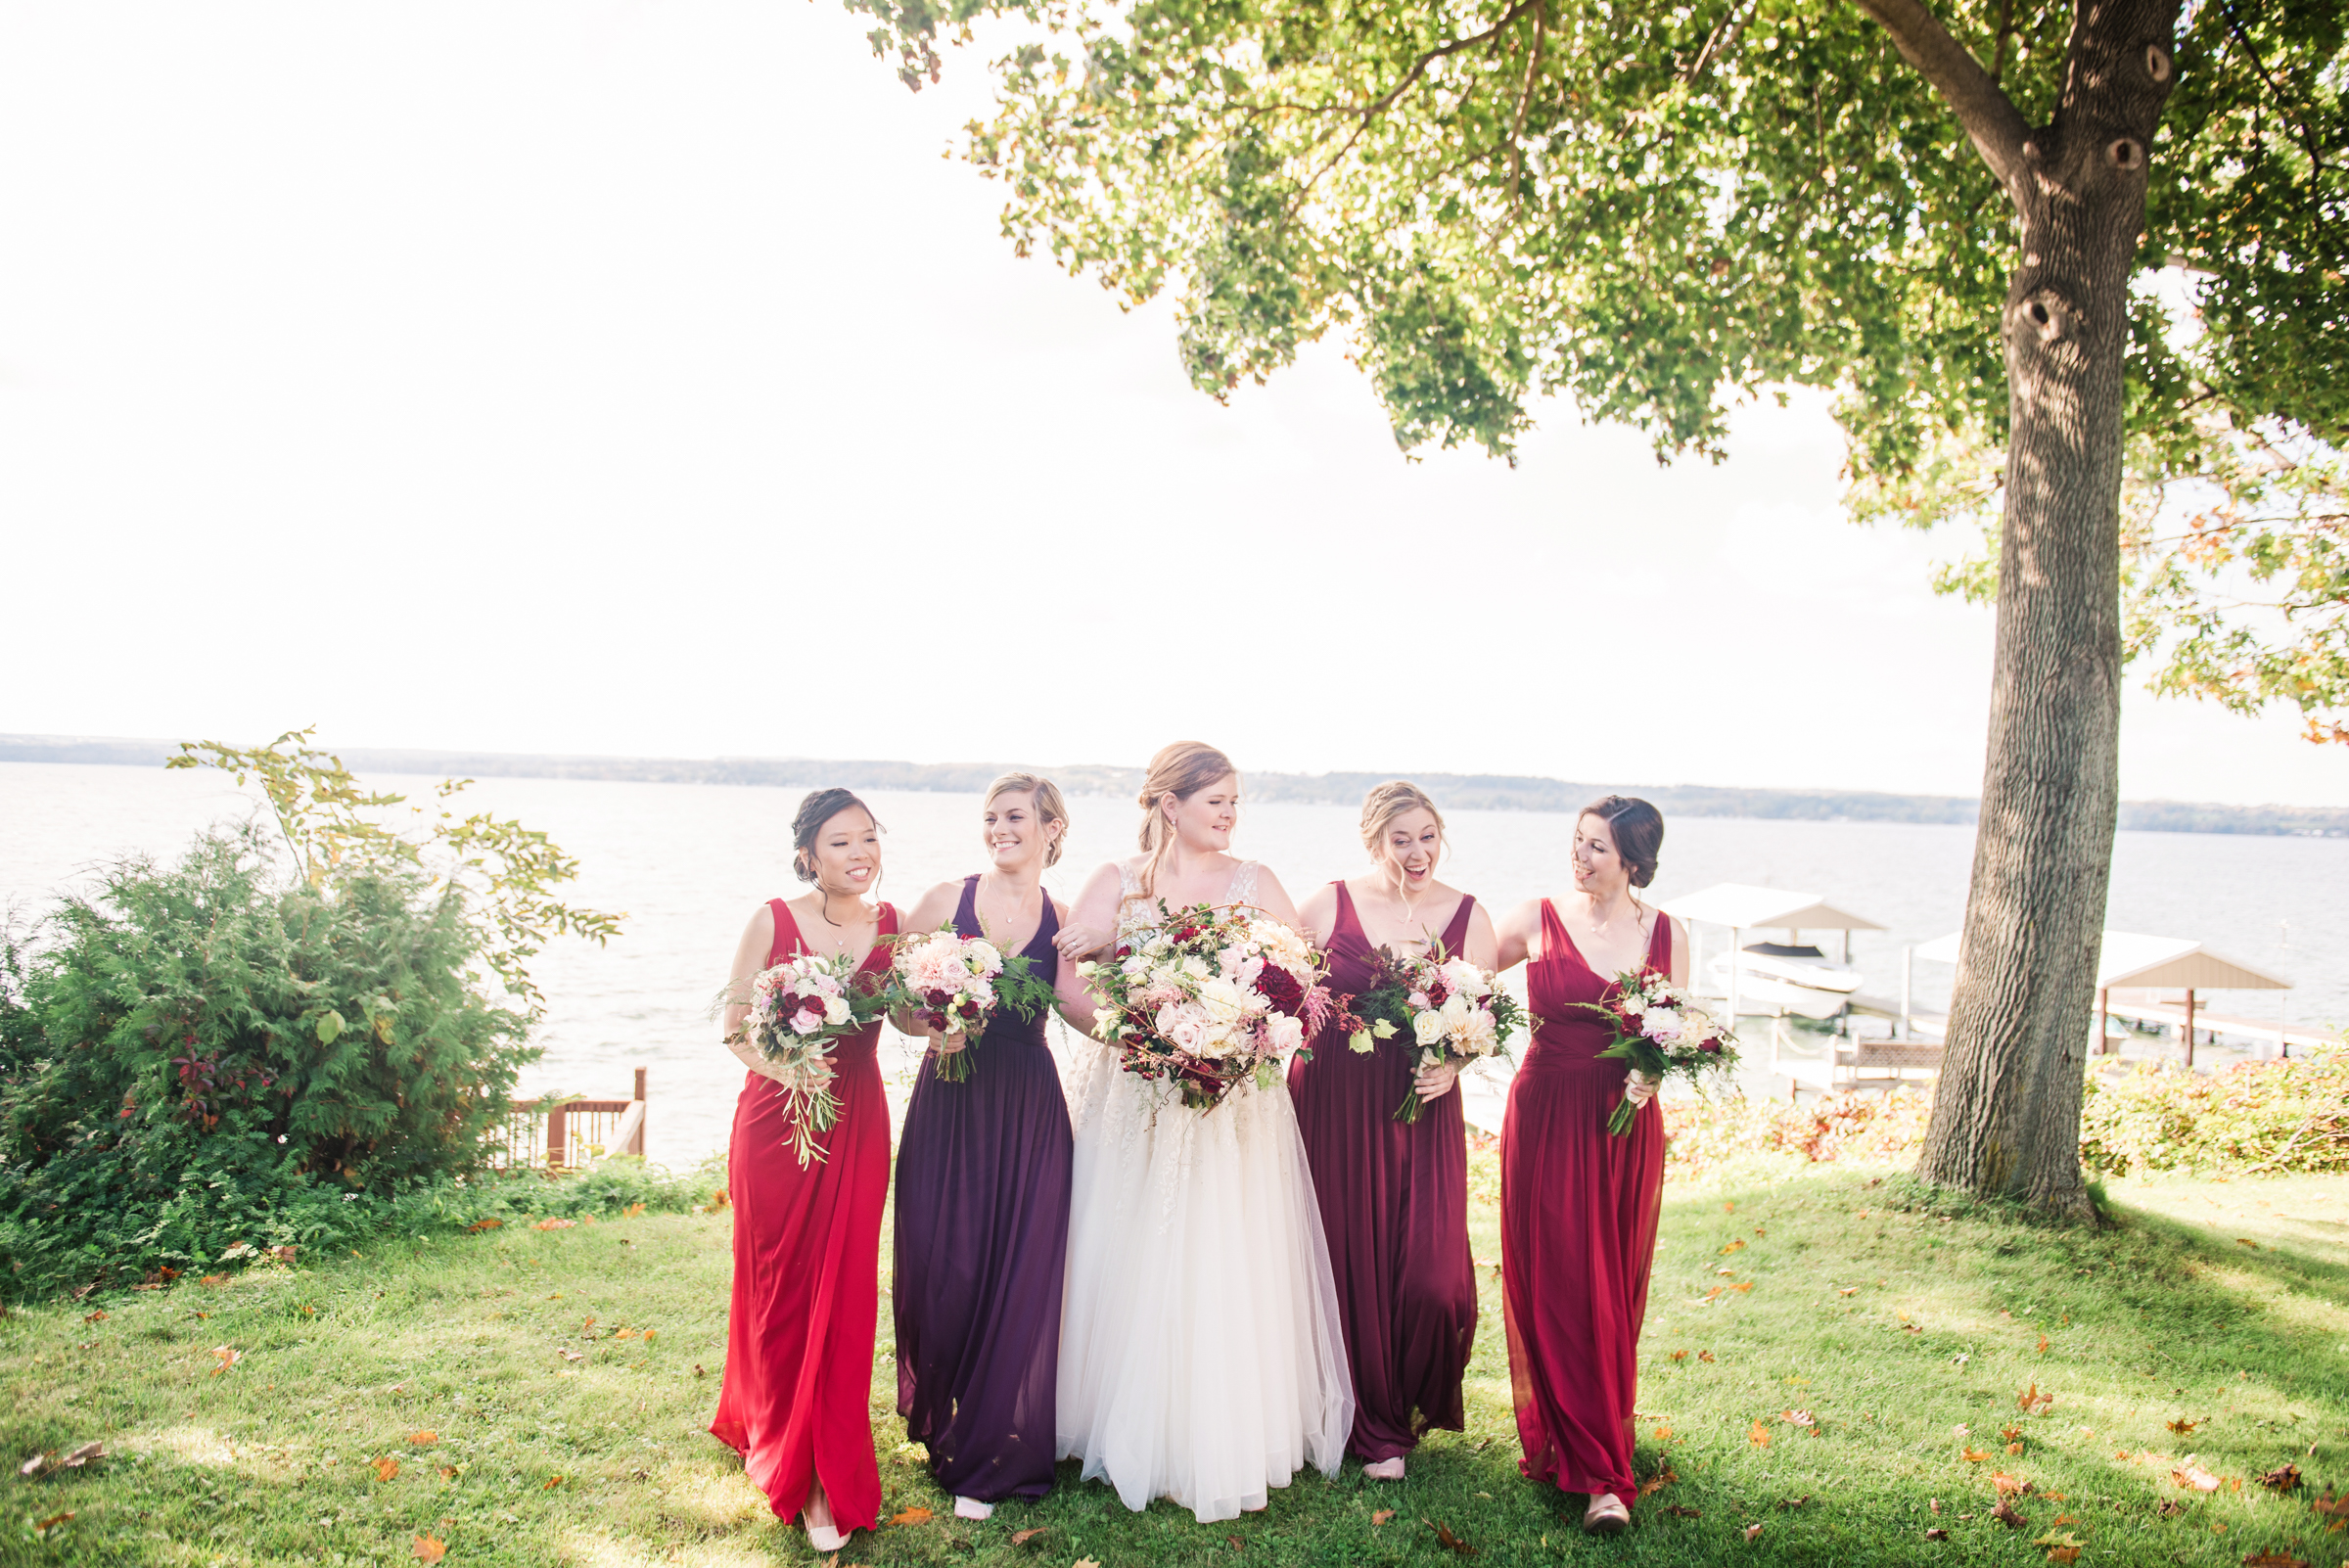 Zugibe_Vineyards_Finger_Lakes_Wedding_JILL_STUDIO_Rochester_NY_Photographer_DSC_3296.jpg